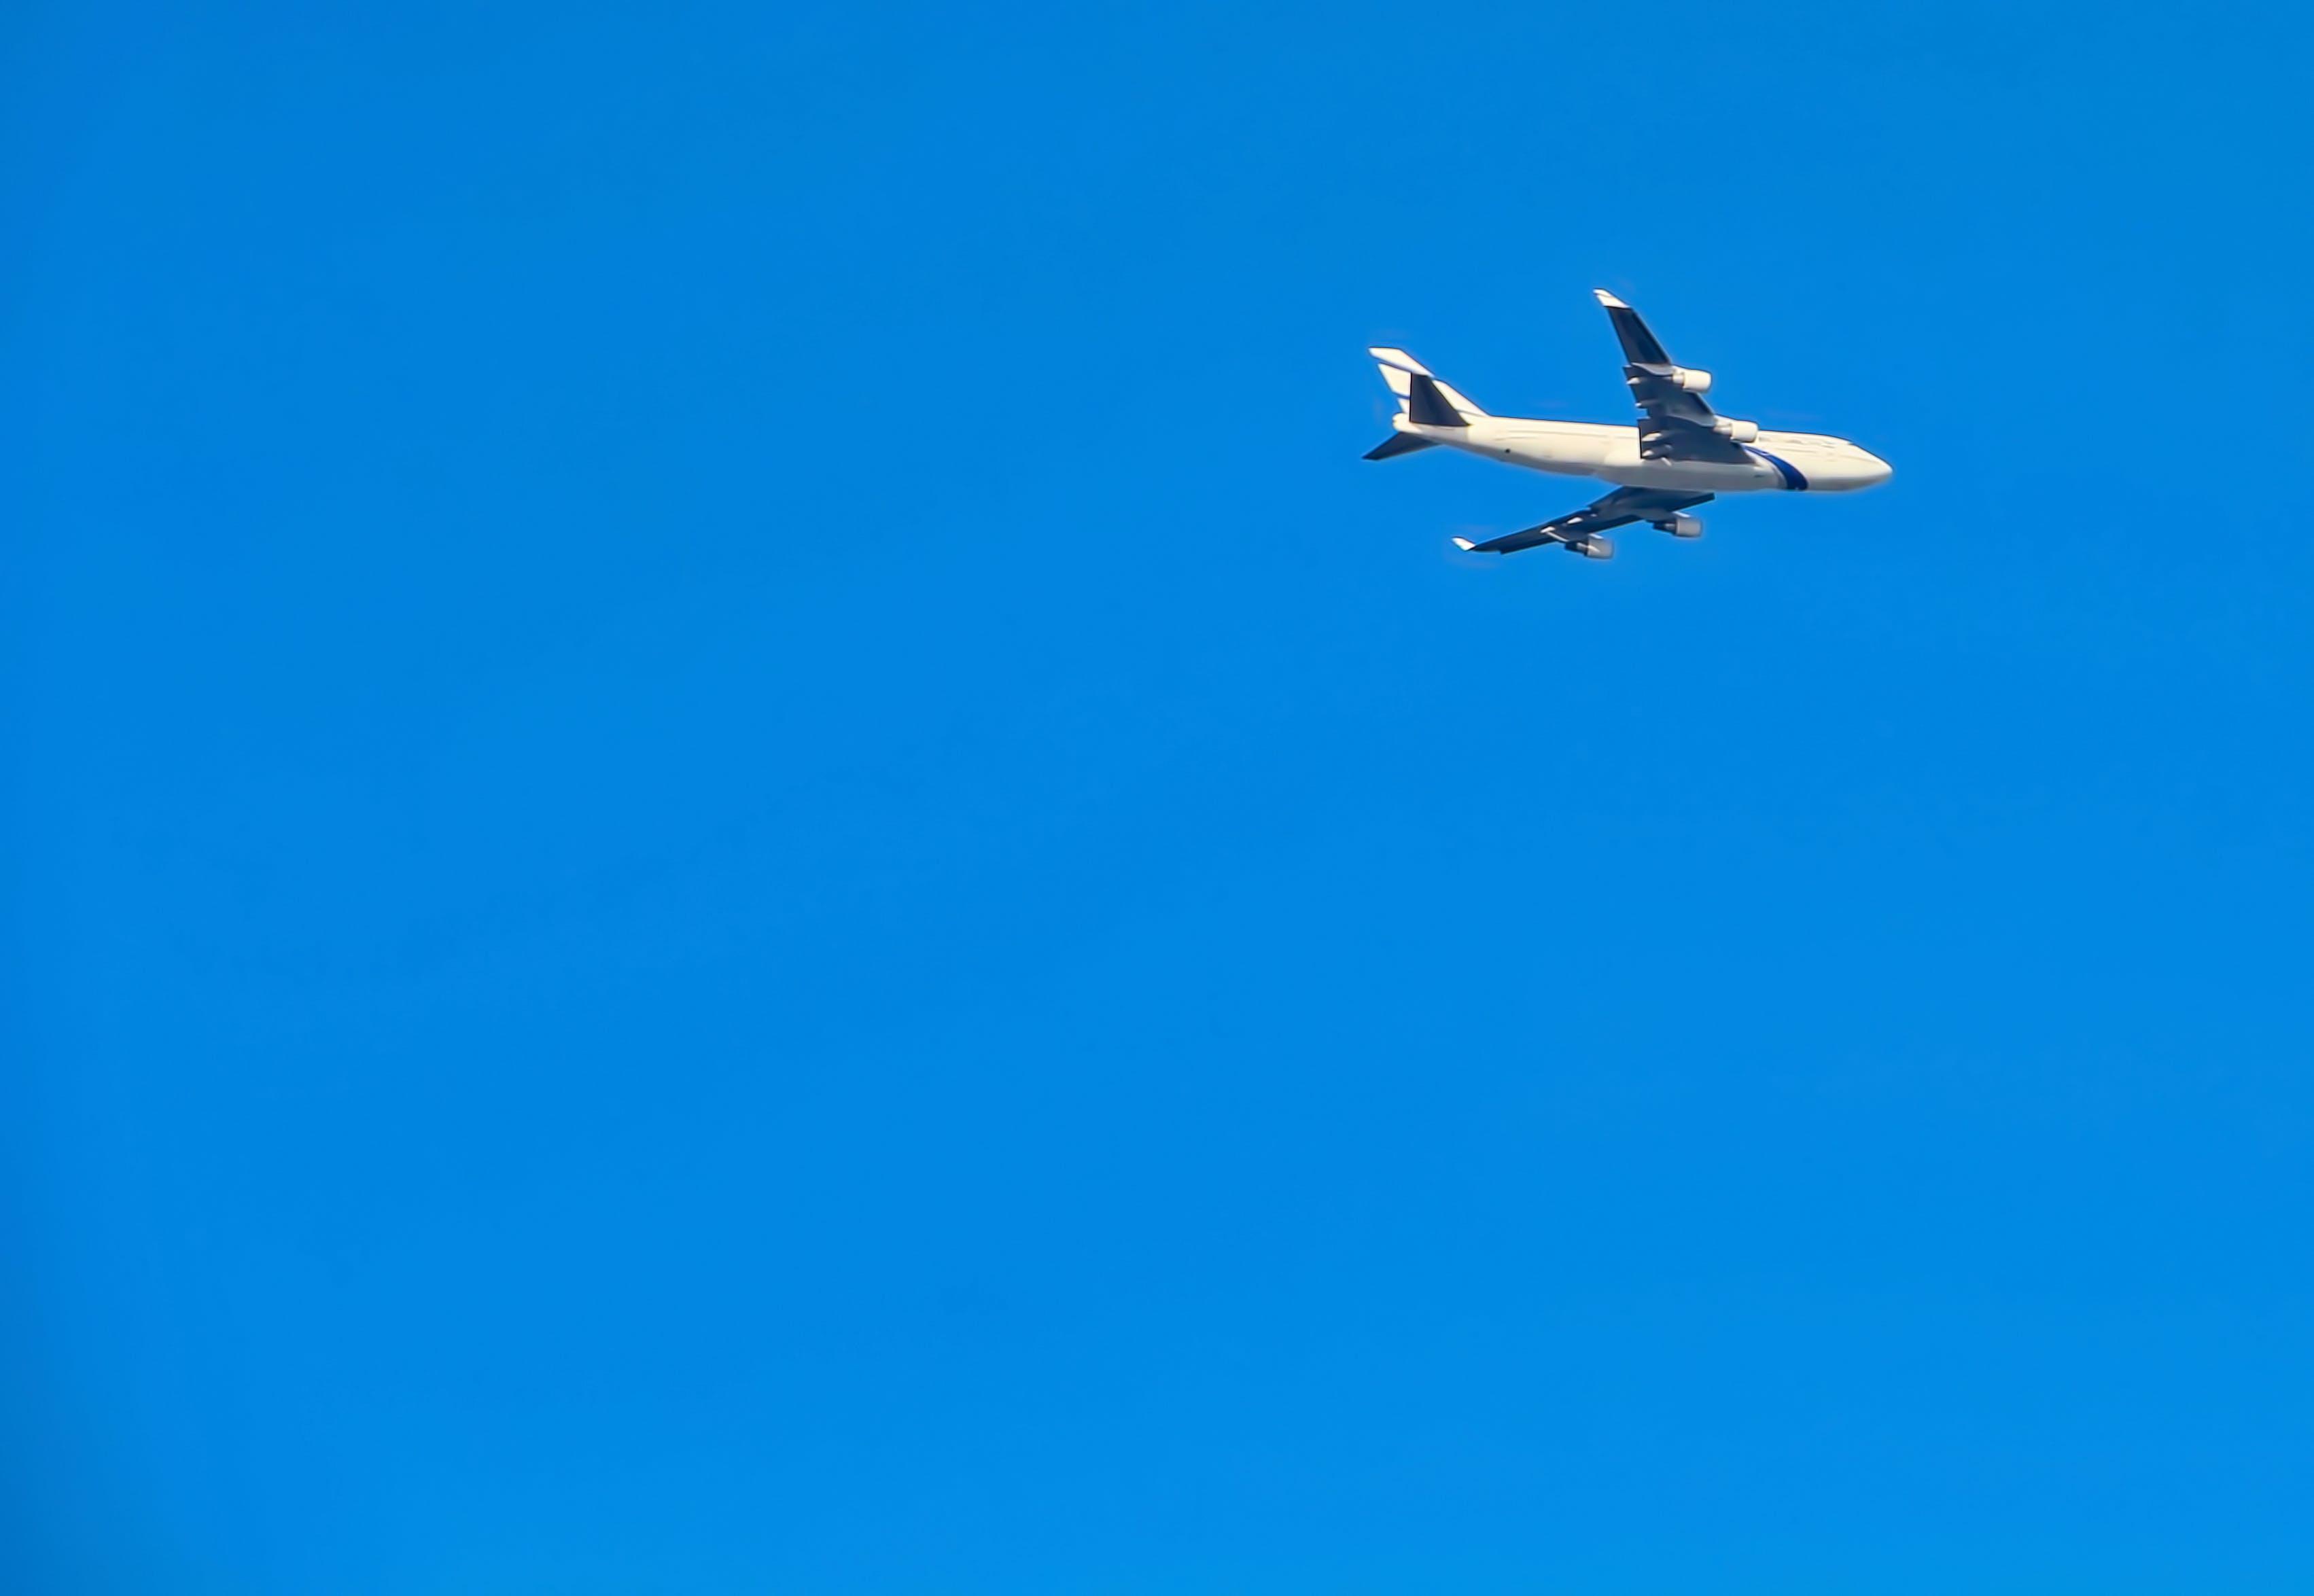 Timelapse Photography of White Passenger Plane in Sky